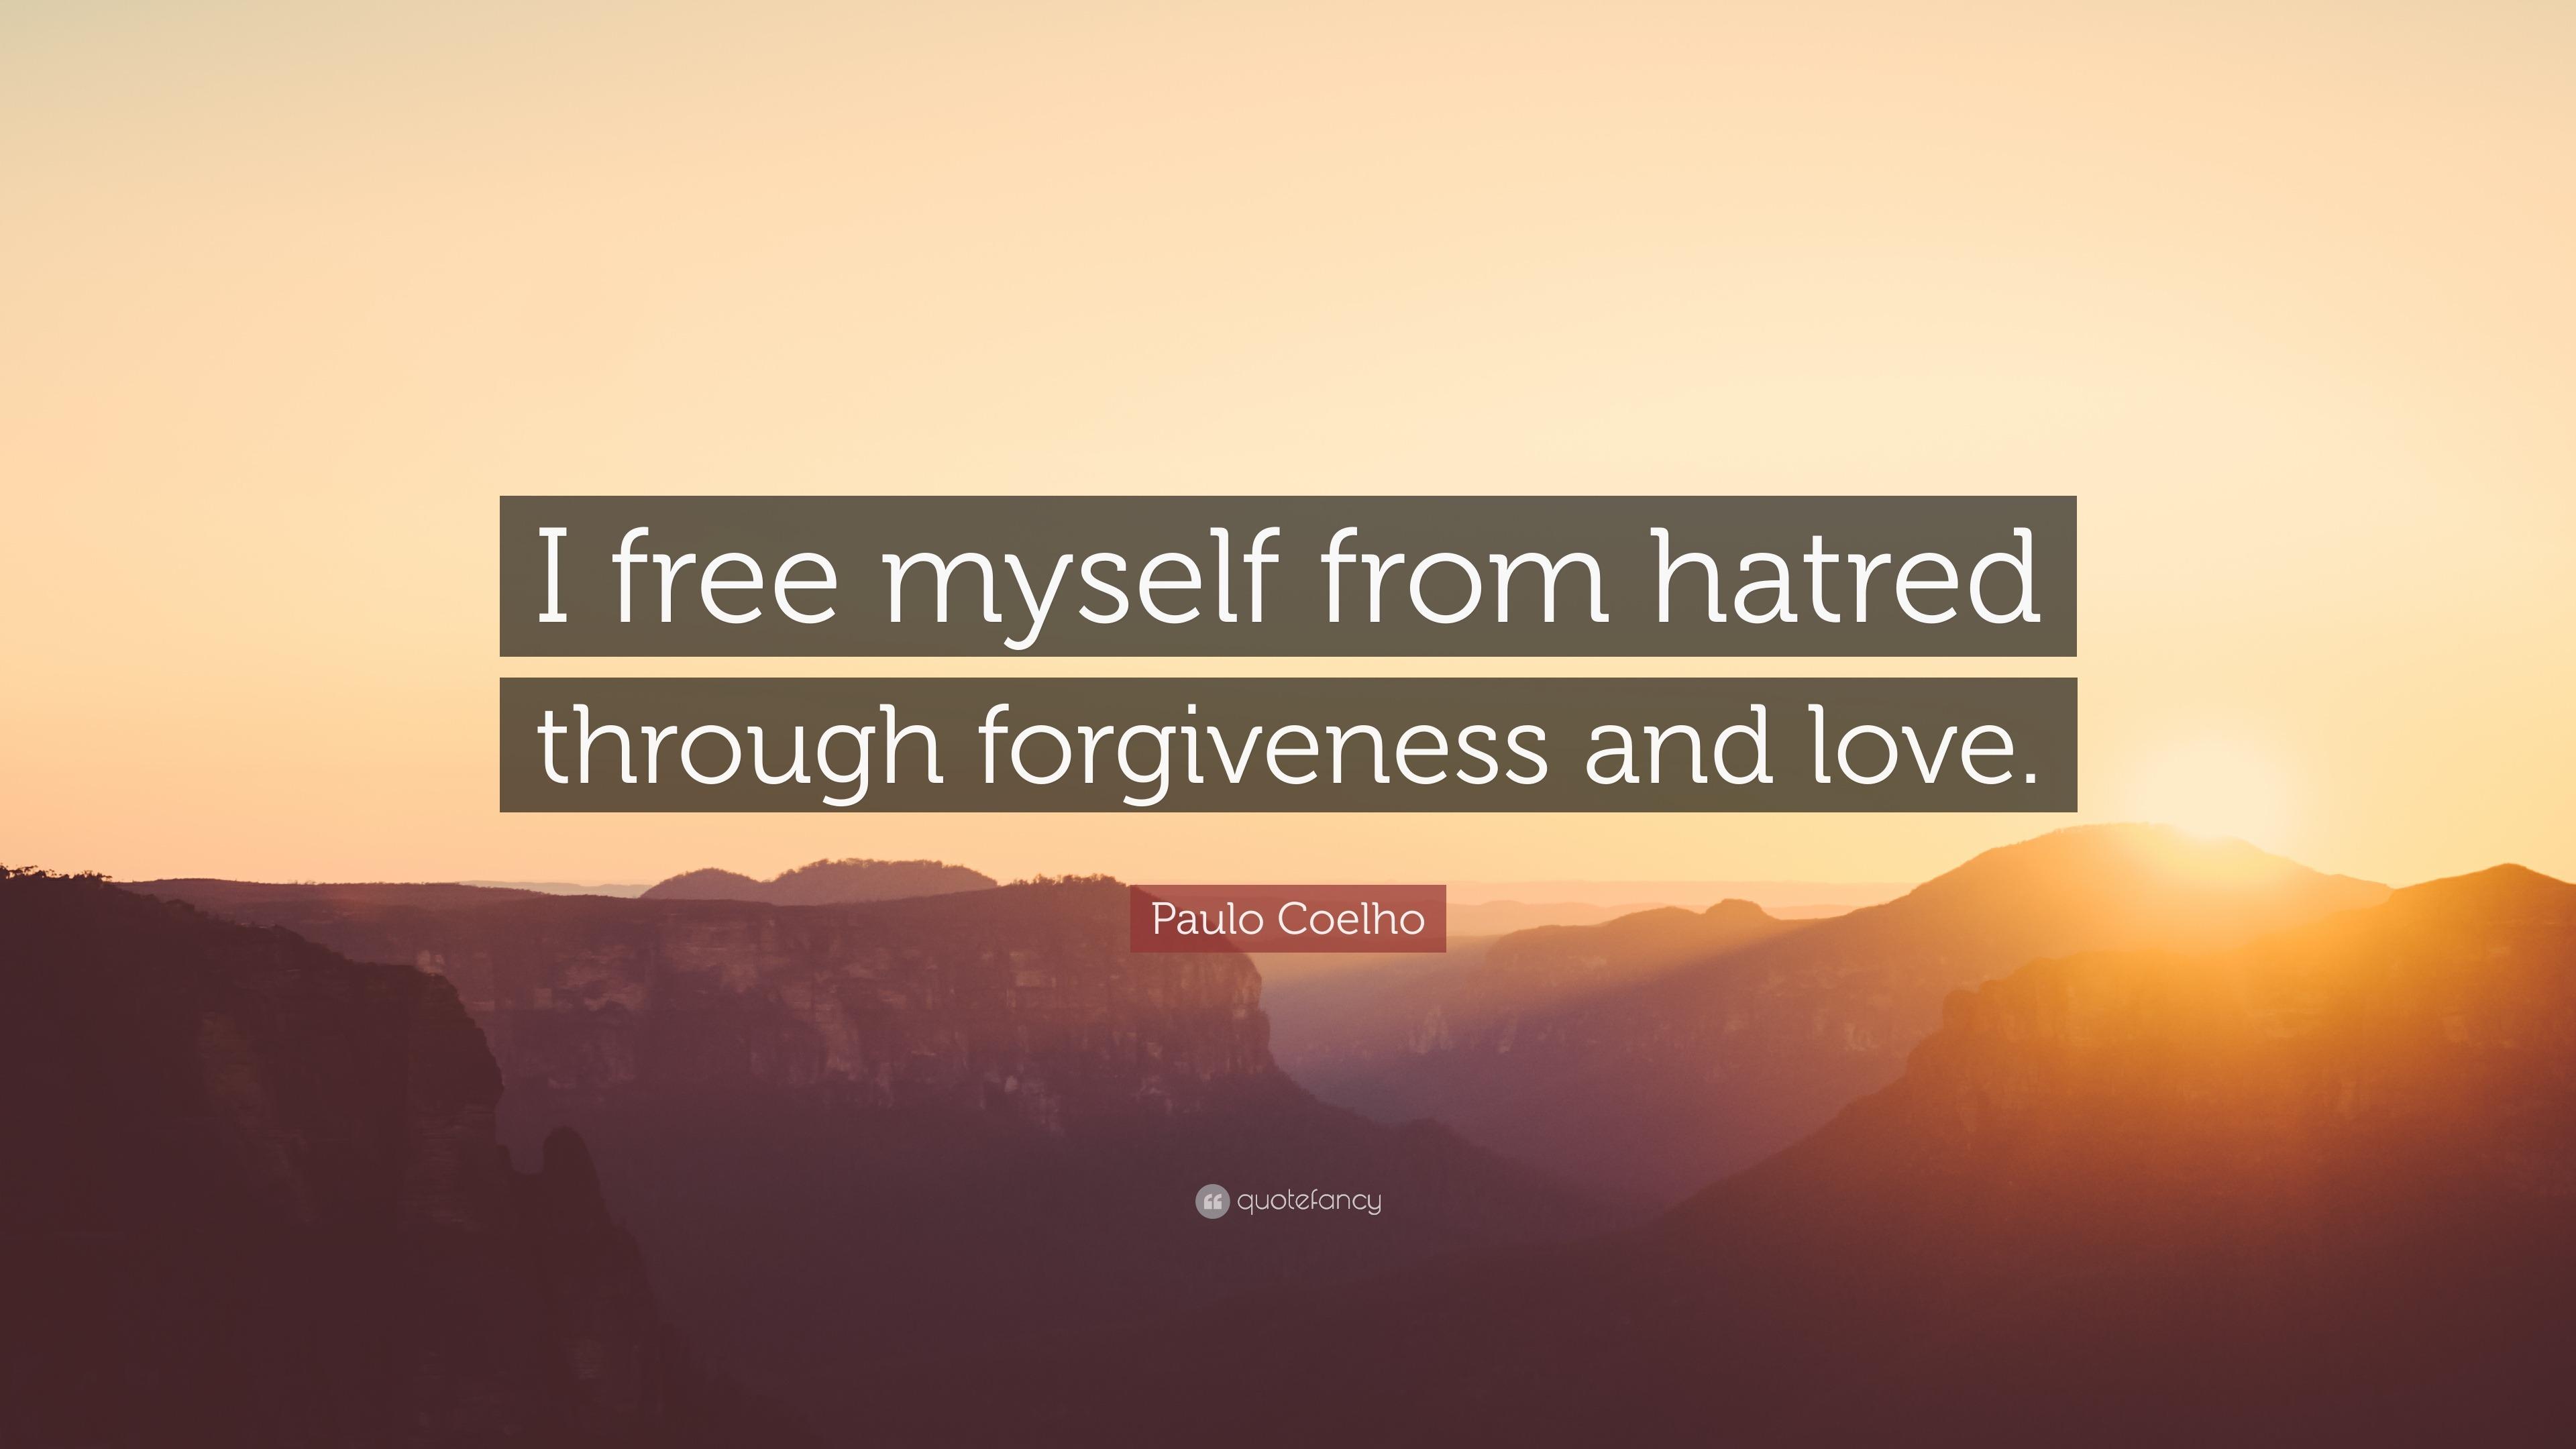 Forgiveness Quotes: U201cI Free Myself From Hatred Through Forgiveness And Love.u201d  U2014